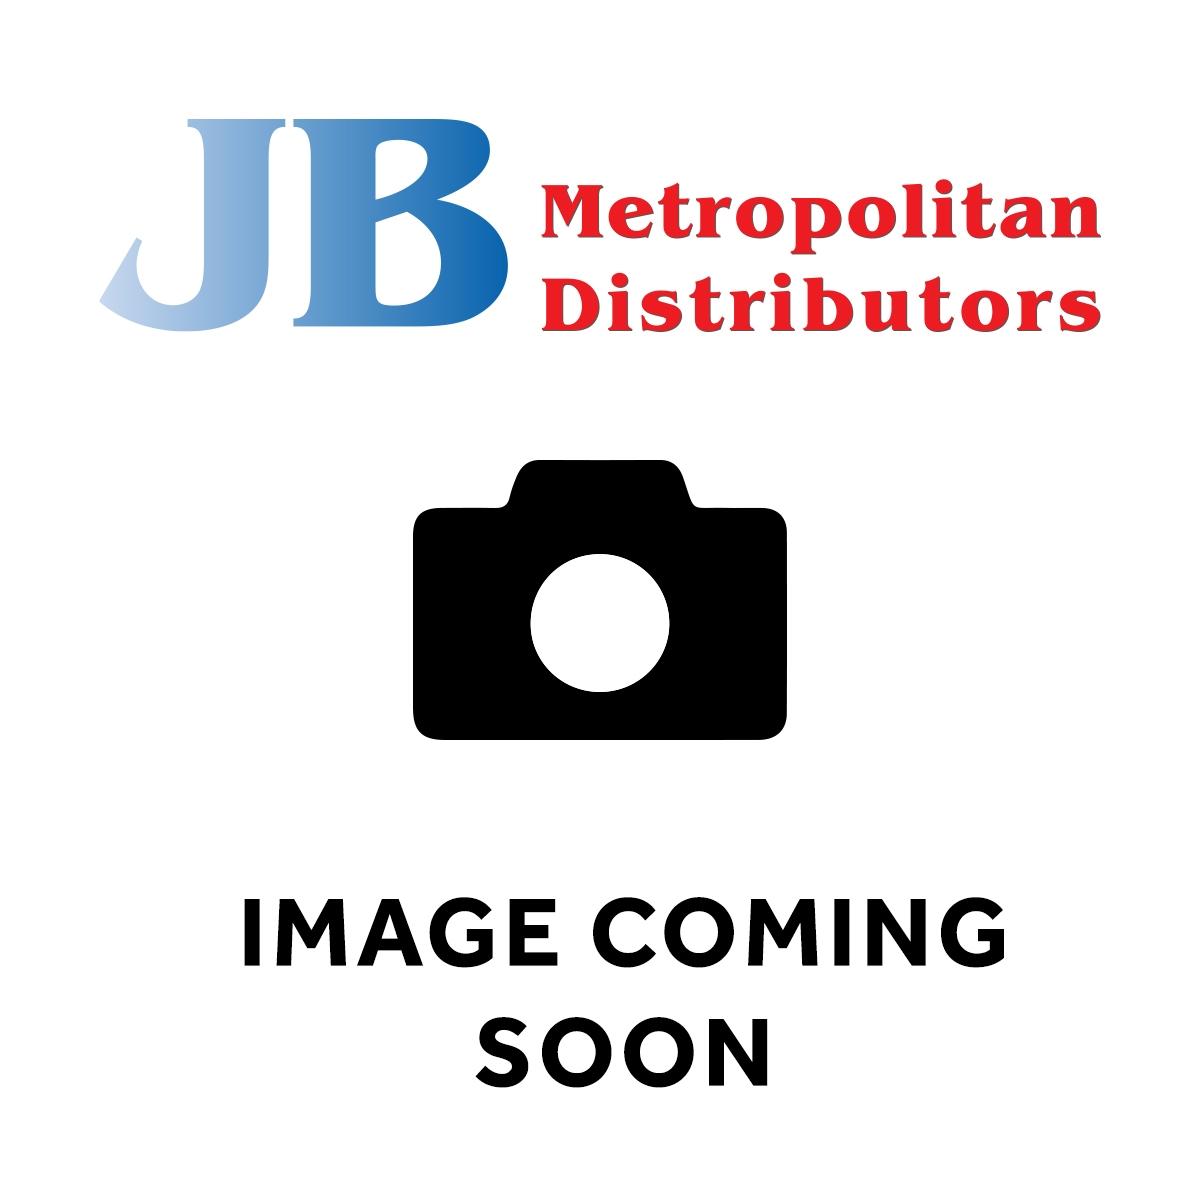 150G SMITHS CHEESE MASHUPS